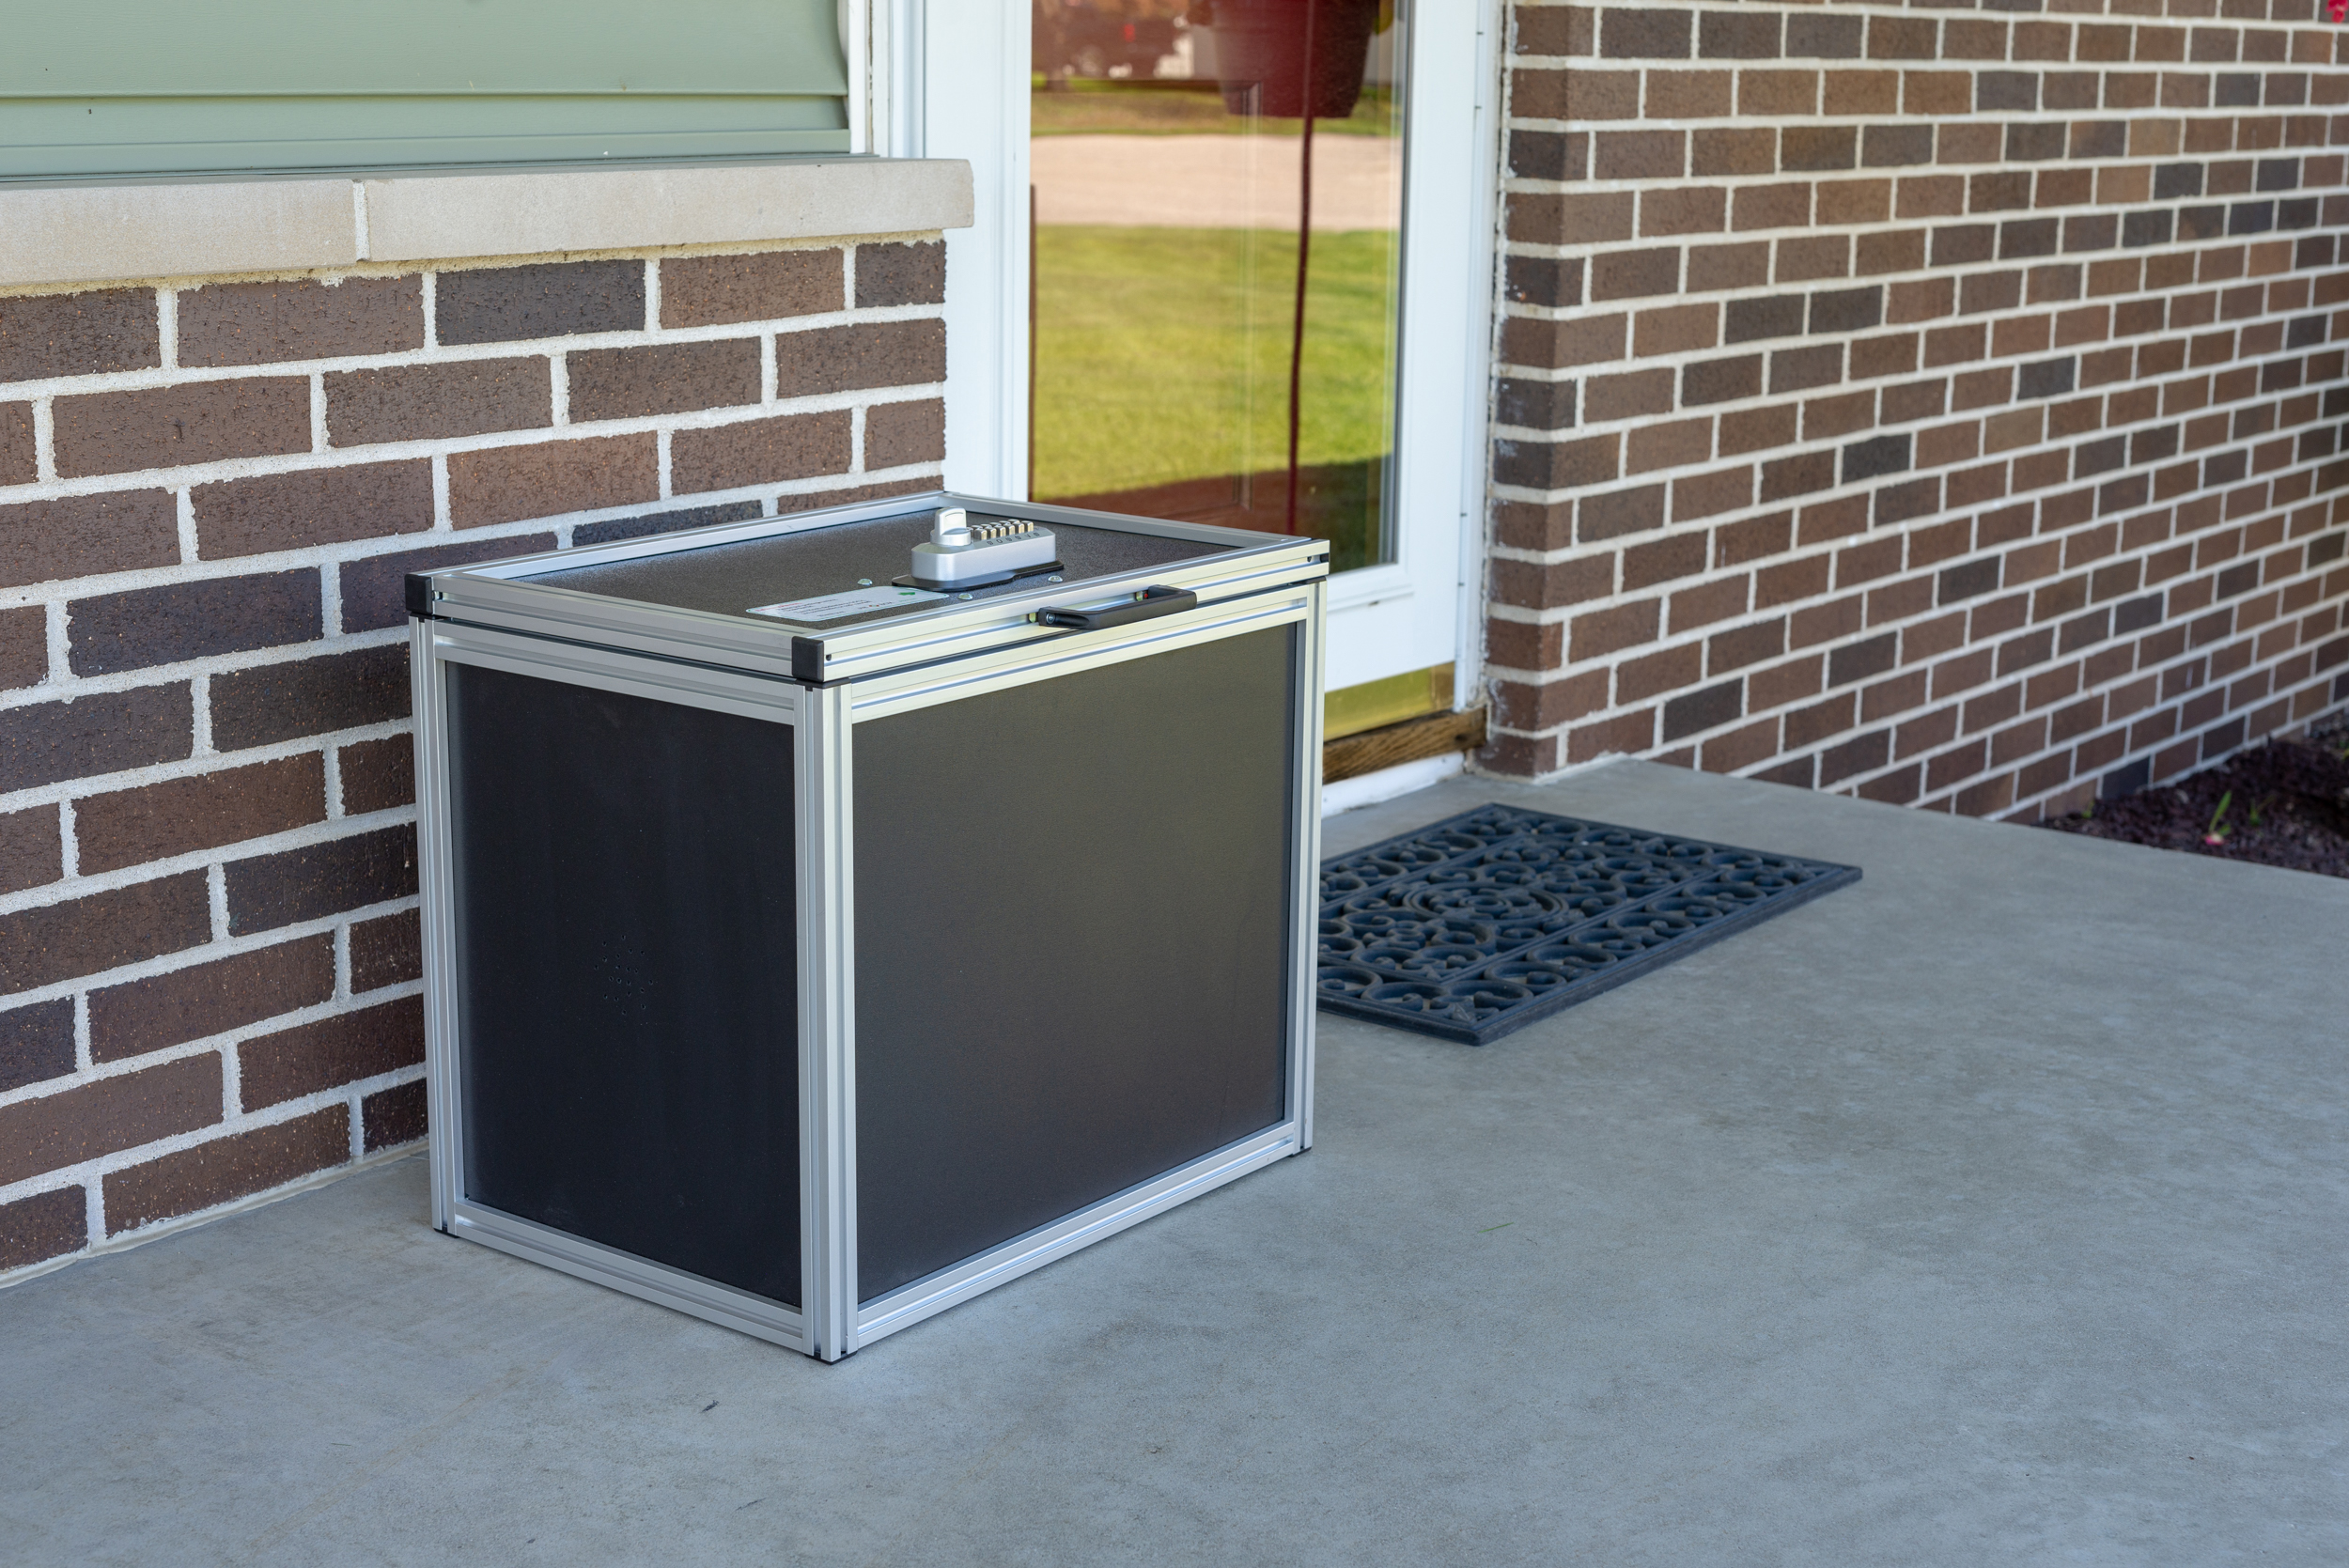 JIB Box with SINTRA PVC